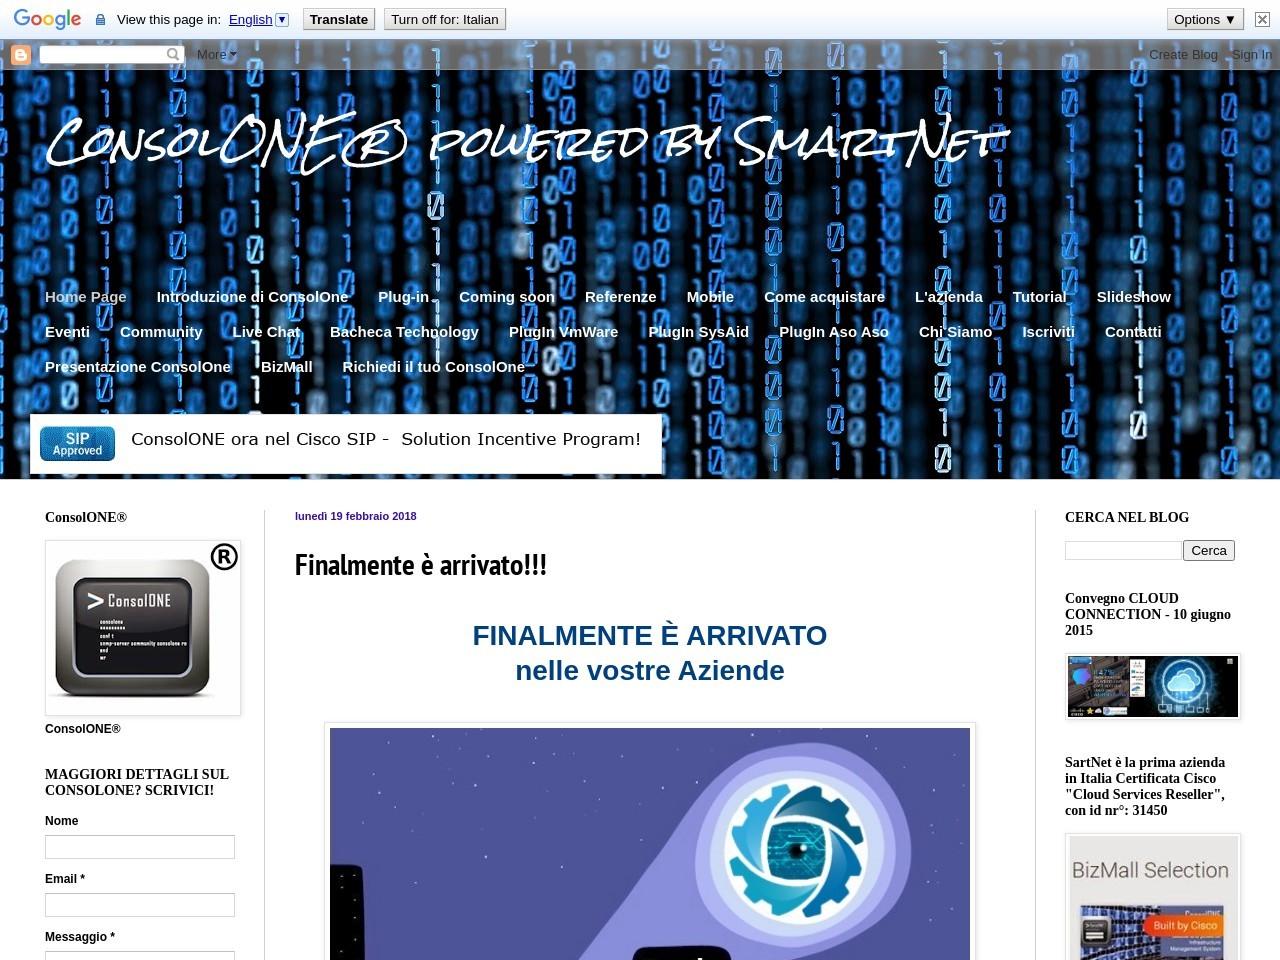 consolone-by-smartnet